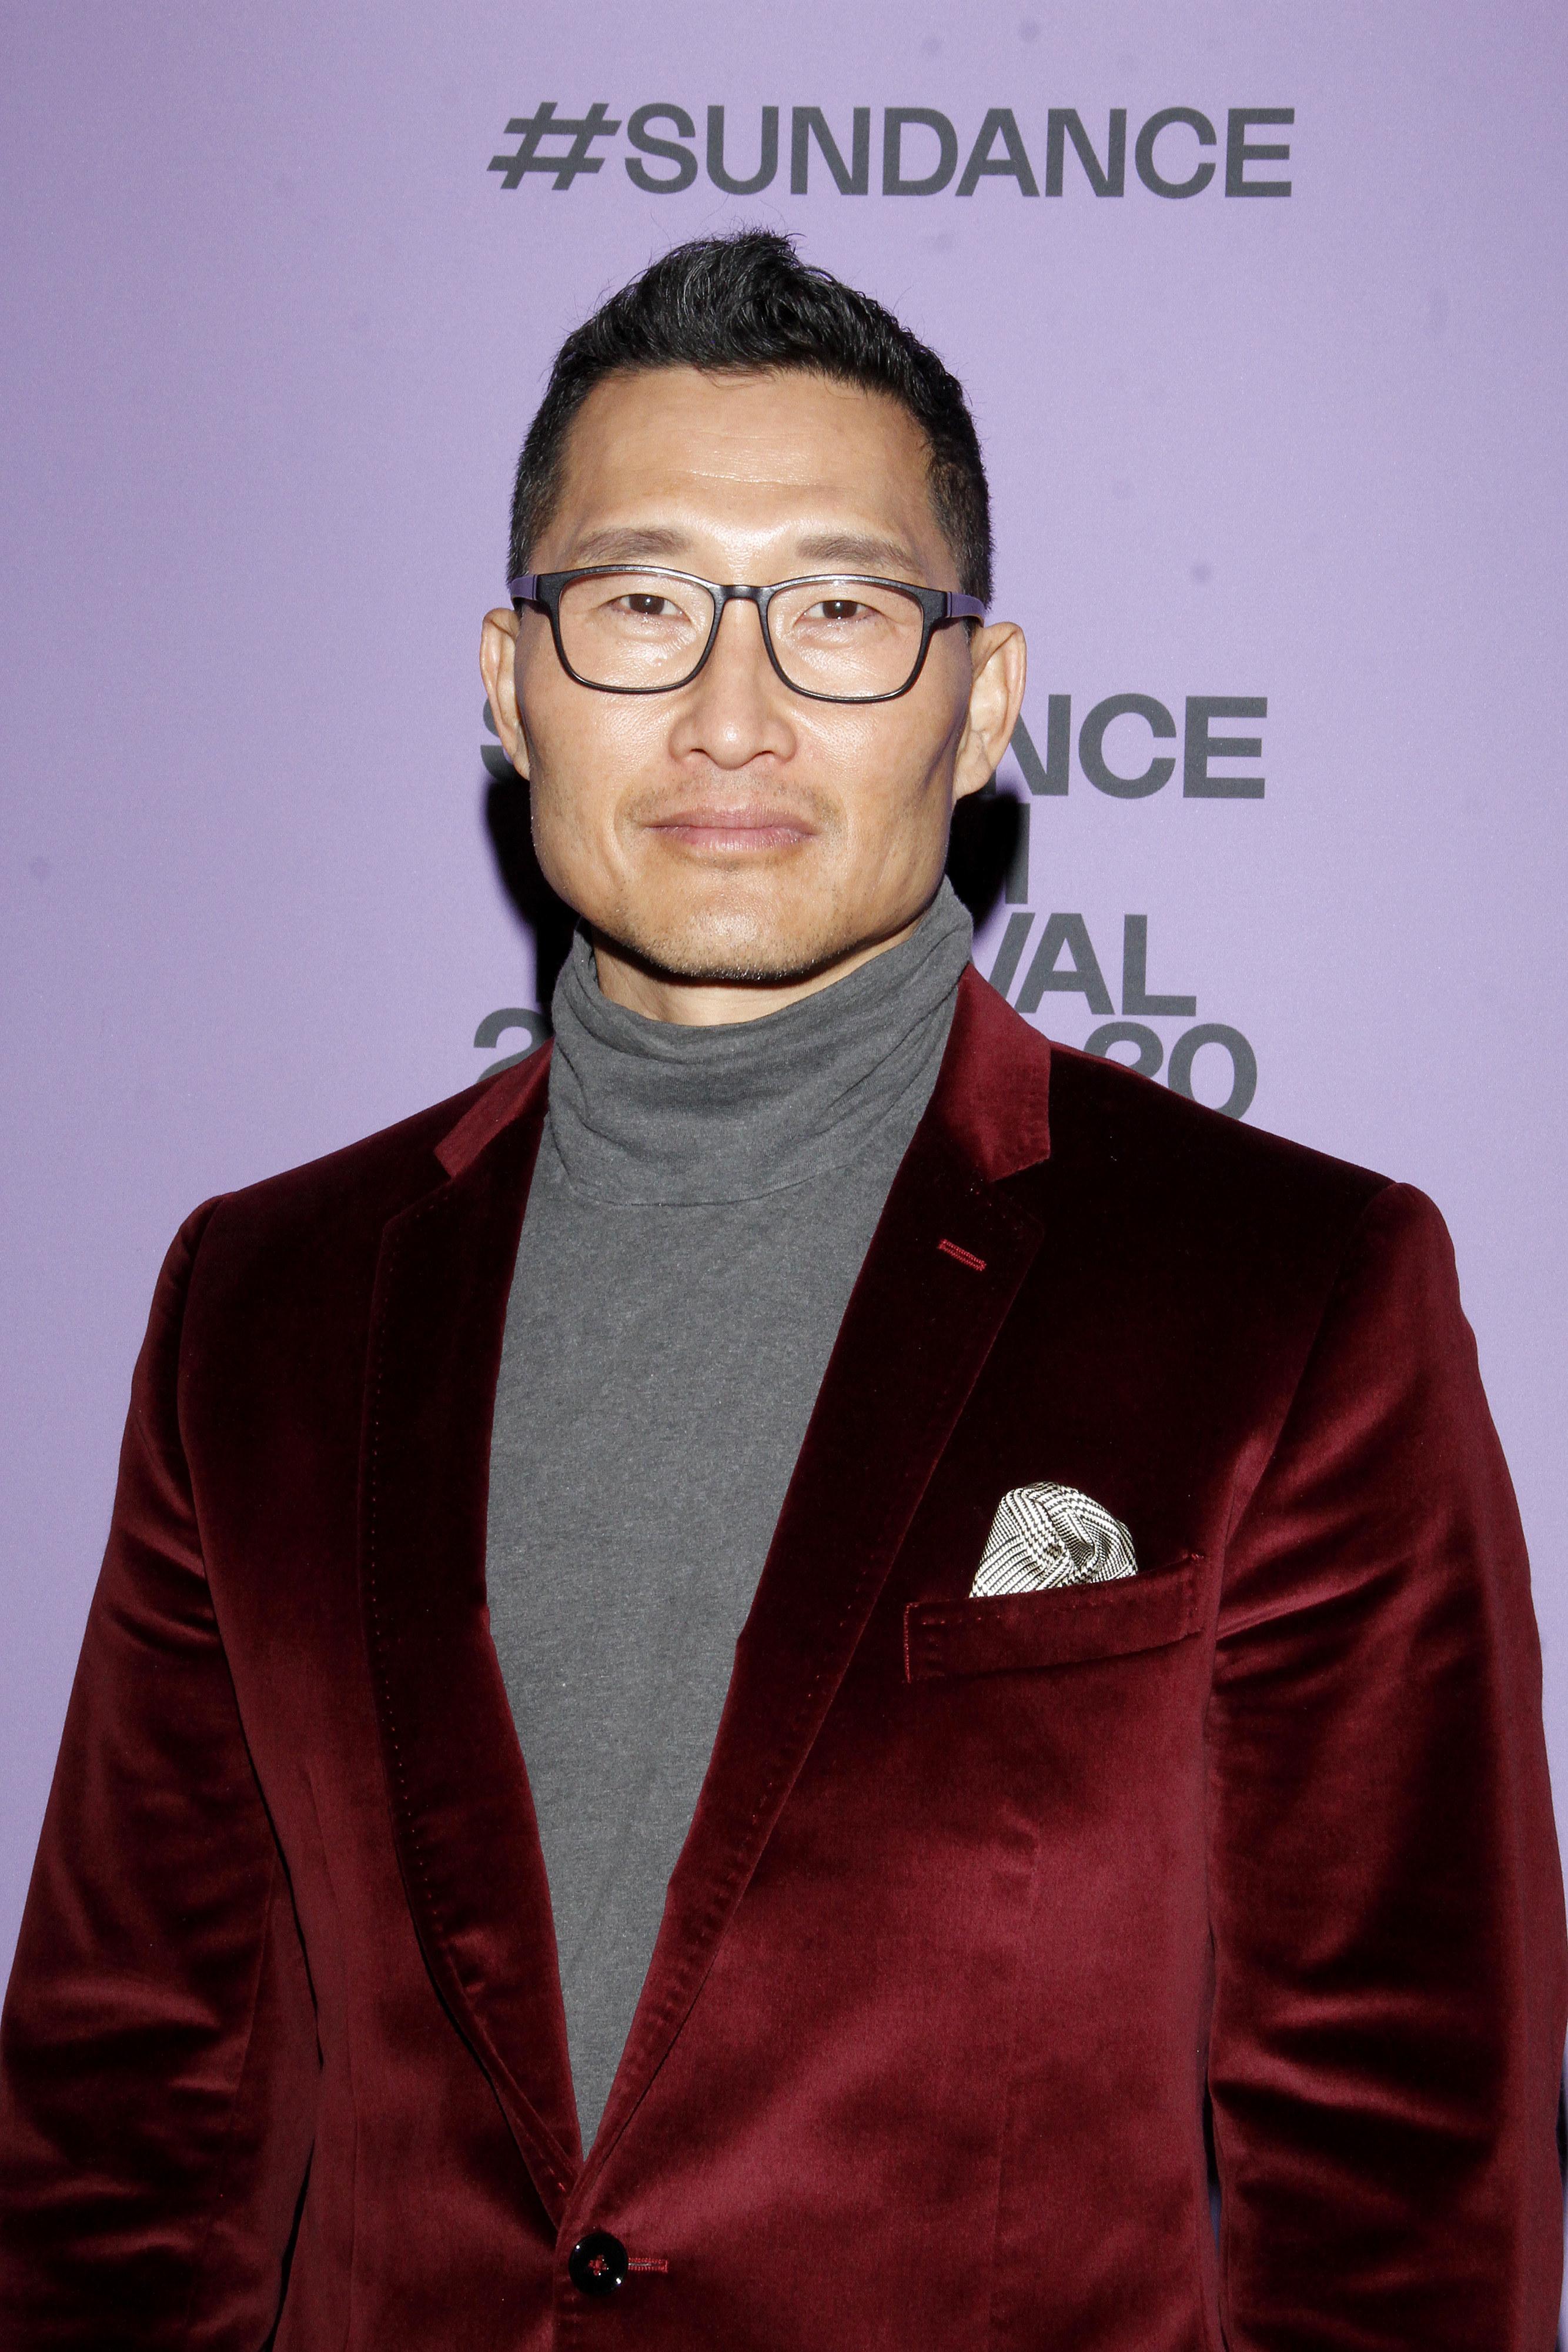 Daniel at the 2020 Sundance Film Festival premiere of 'Blast Beat'